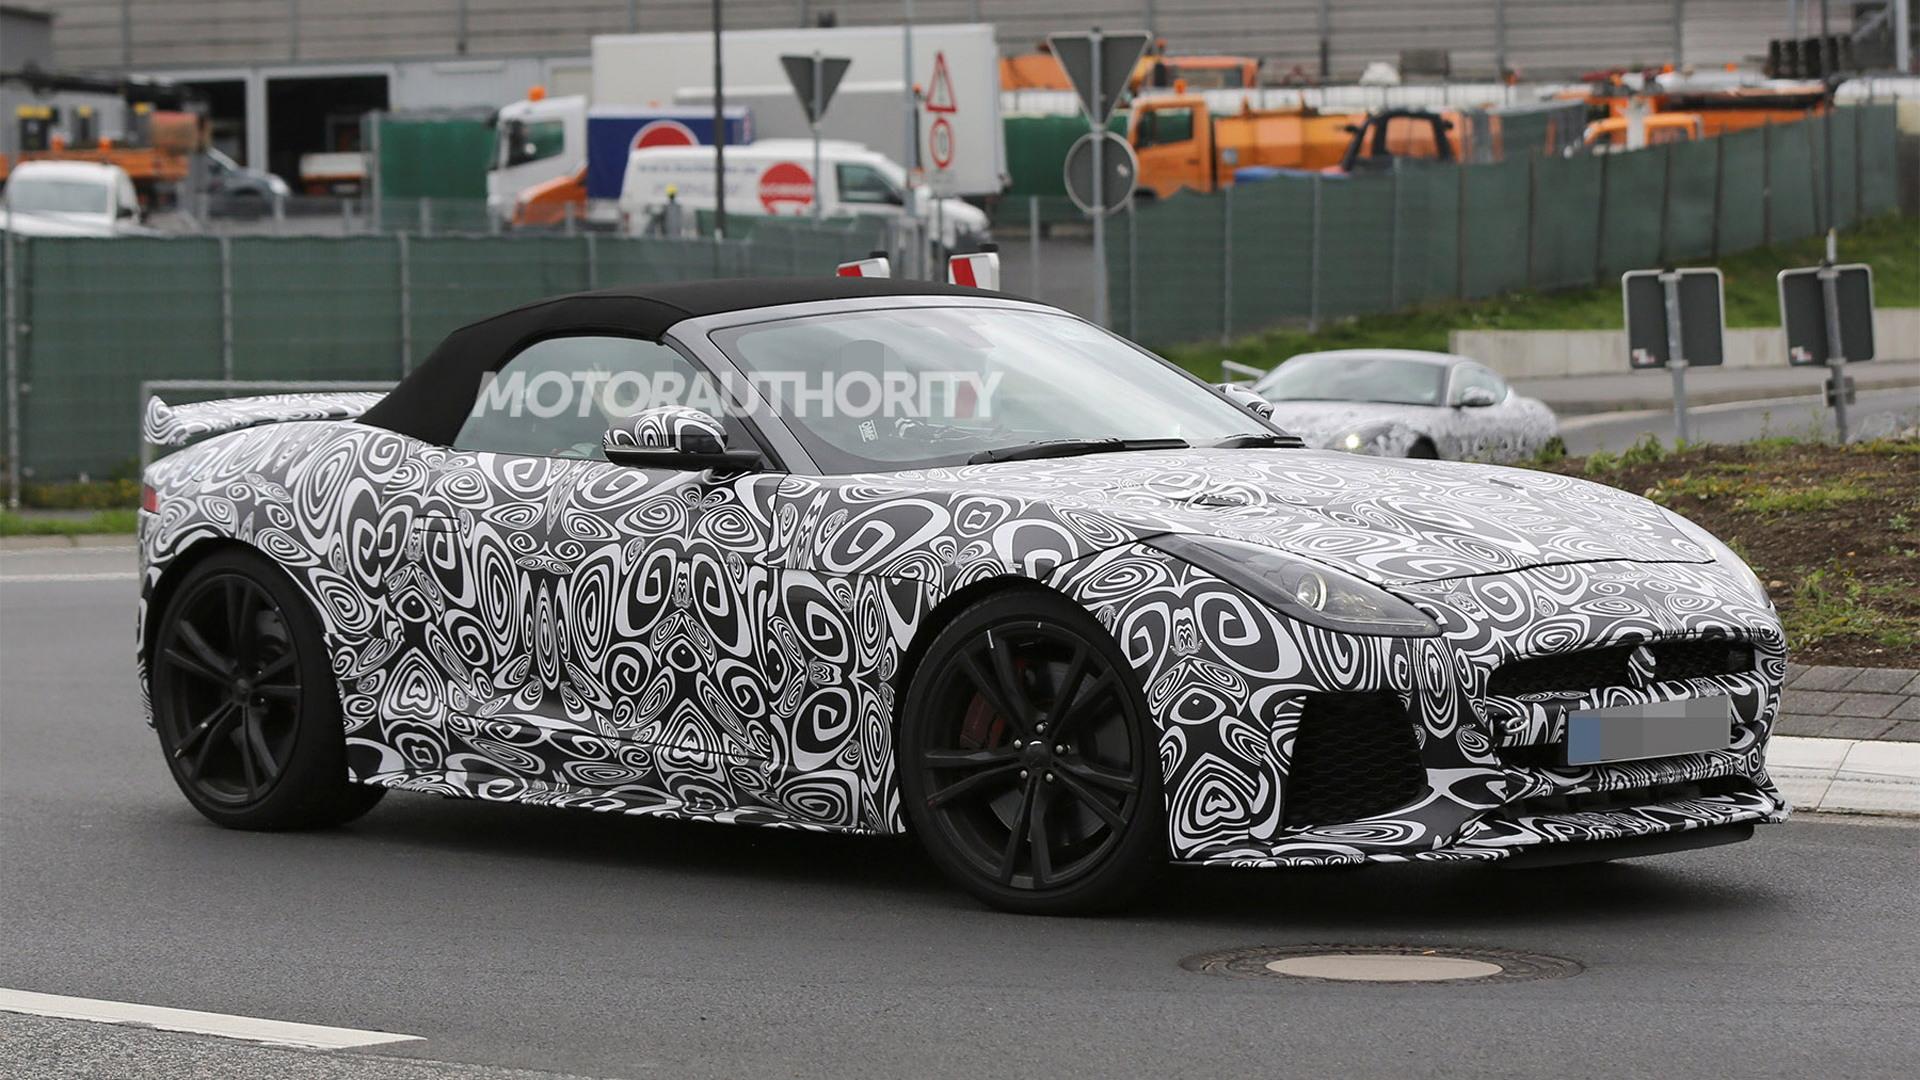 2017 Jaguar F-Type SVR Convertible spy shots - Image via S. Baldauf/SB-Medien